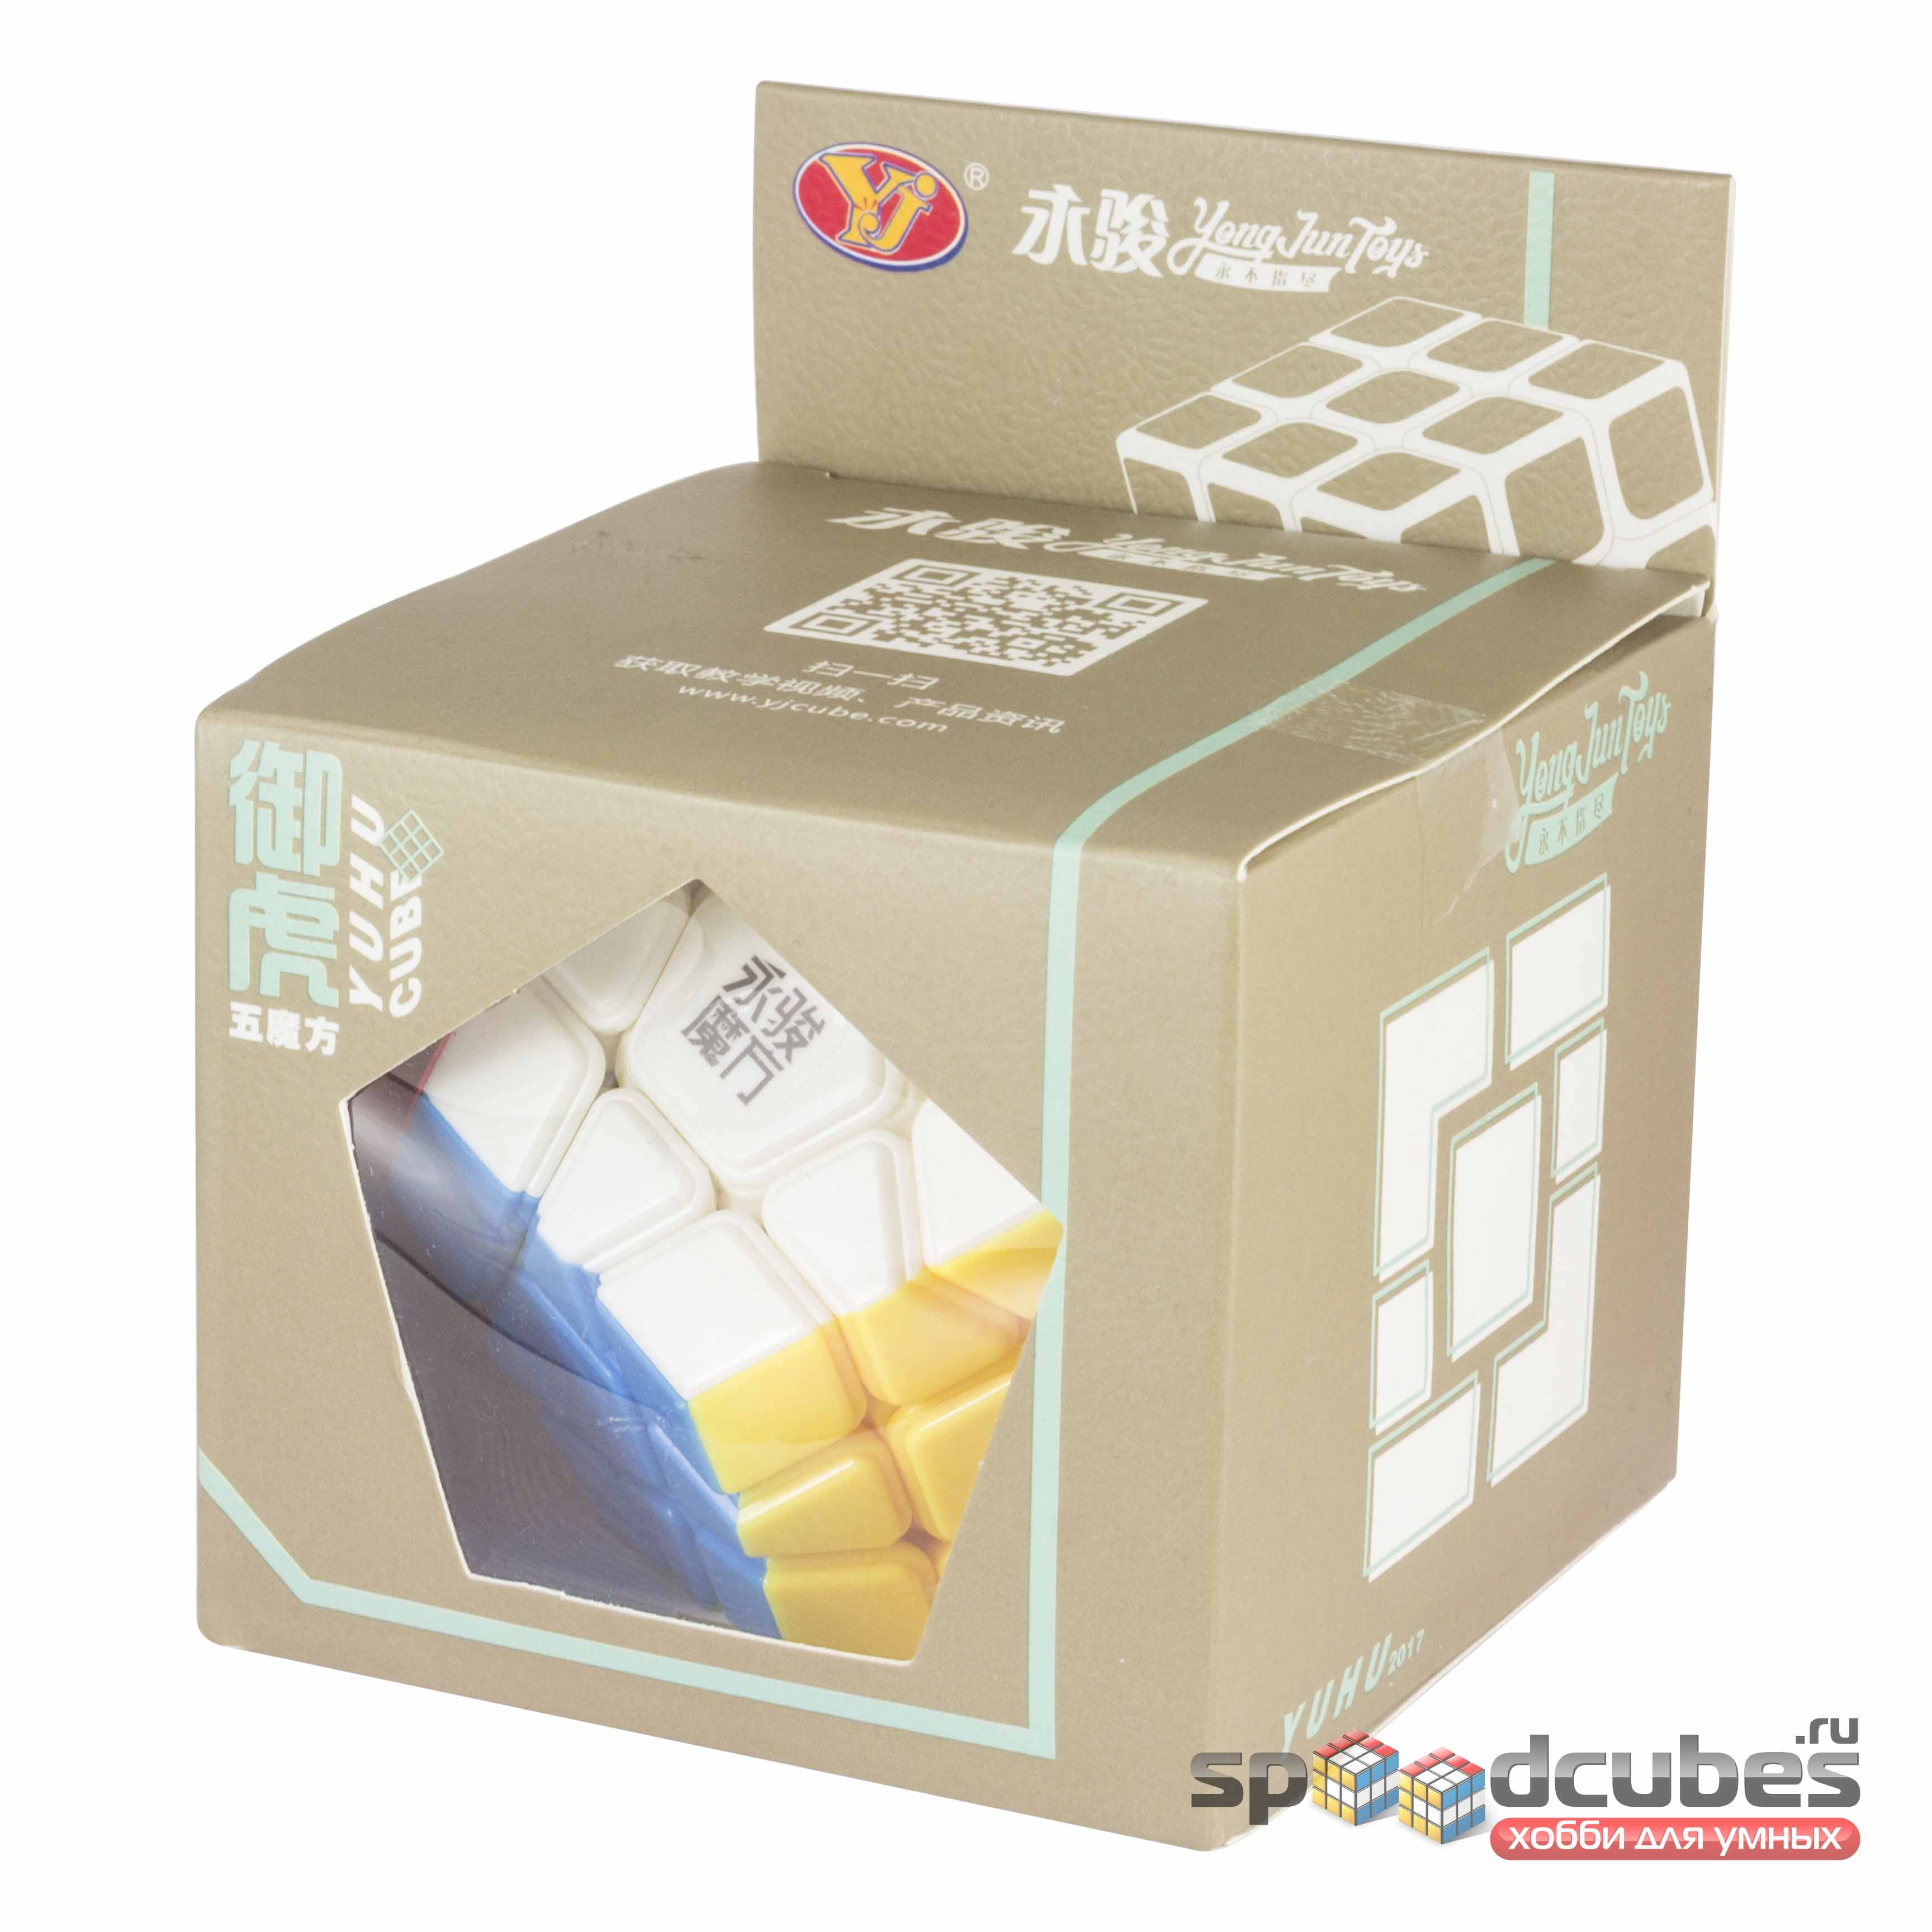 MoYu (YJ) Megaminx Yuhu R (цв) 3